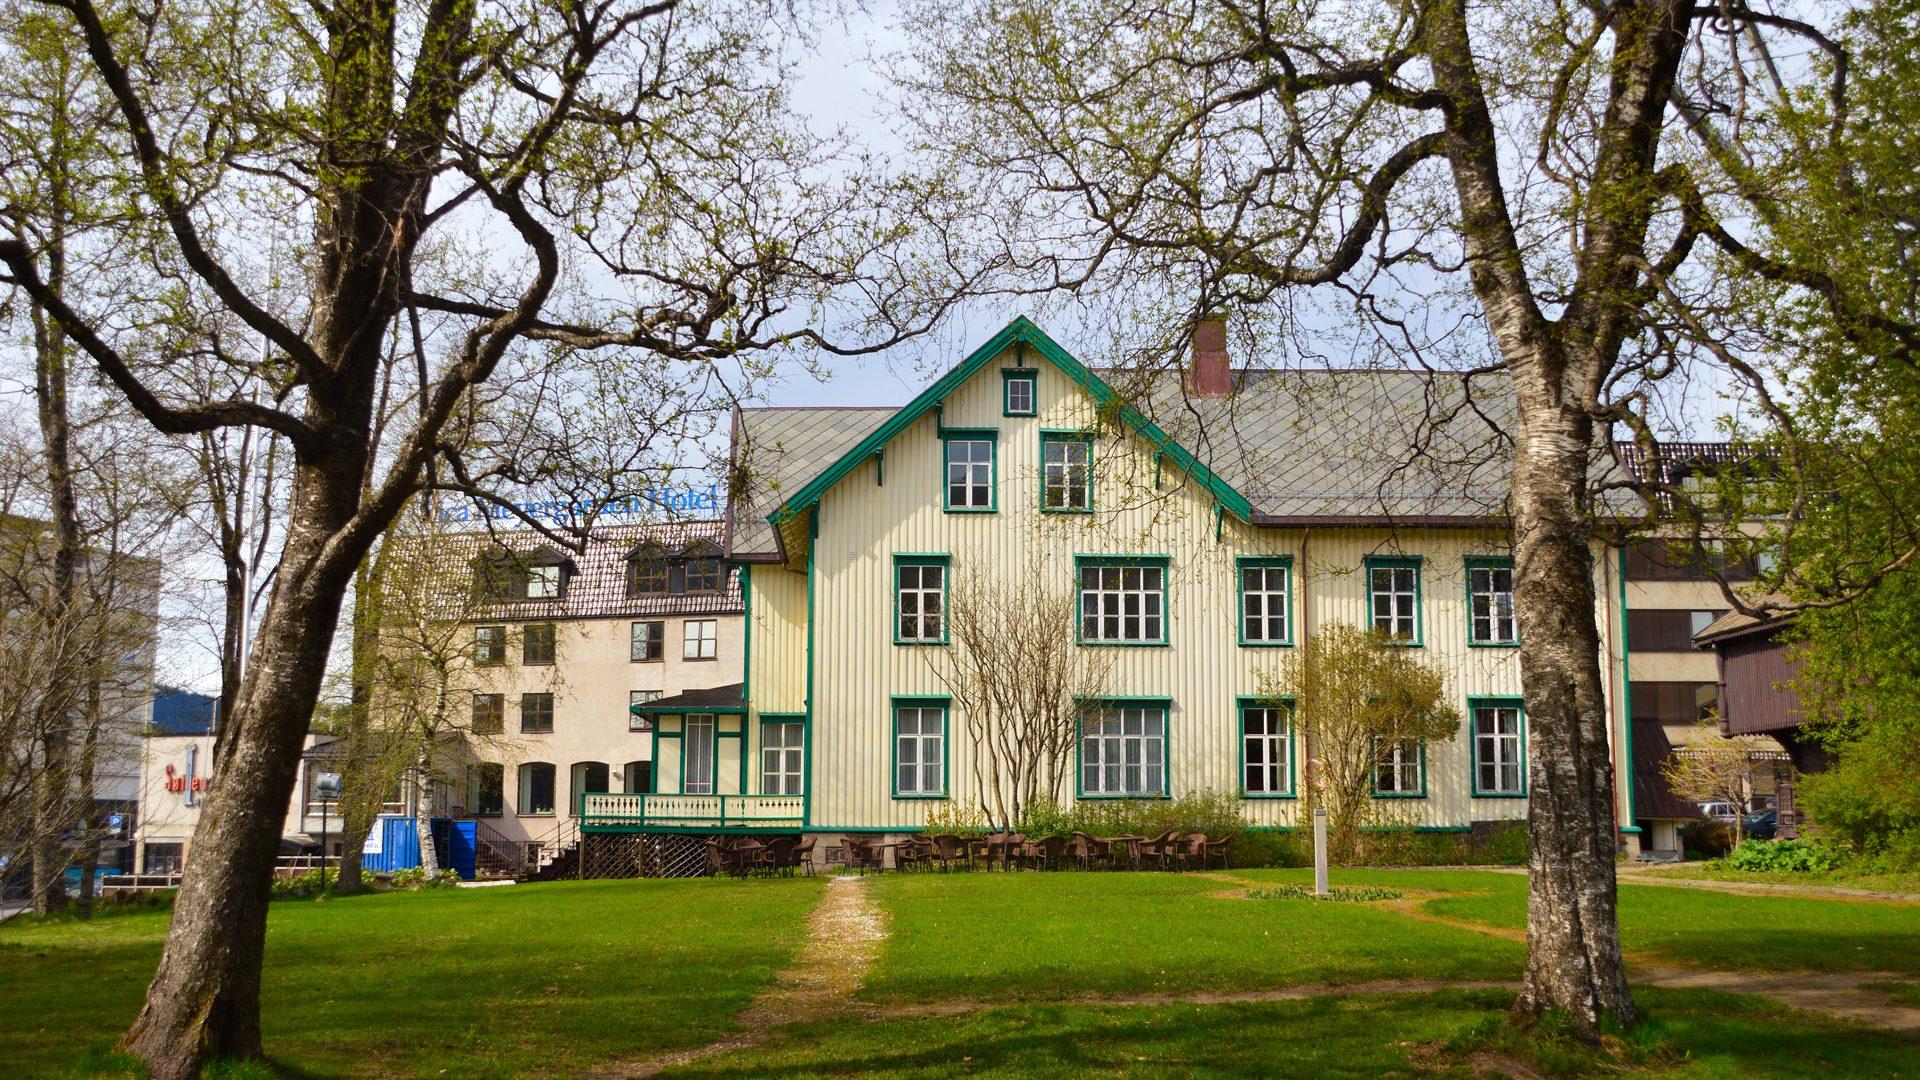 Meyergården Hotell gammelbygg sett fra hagen